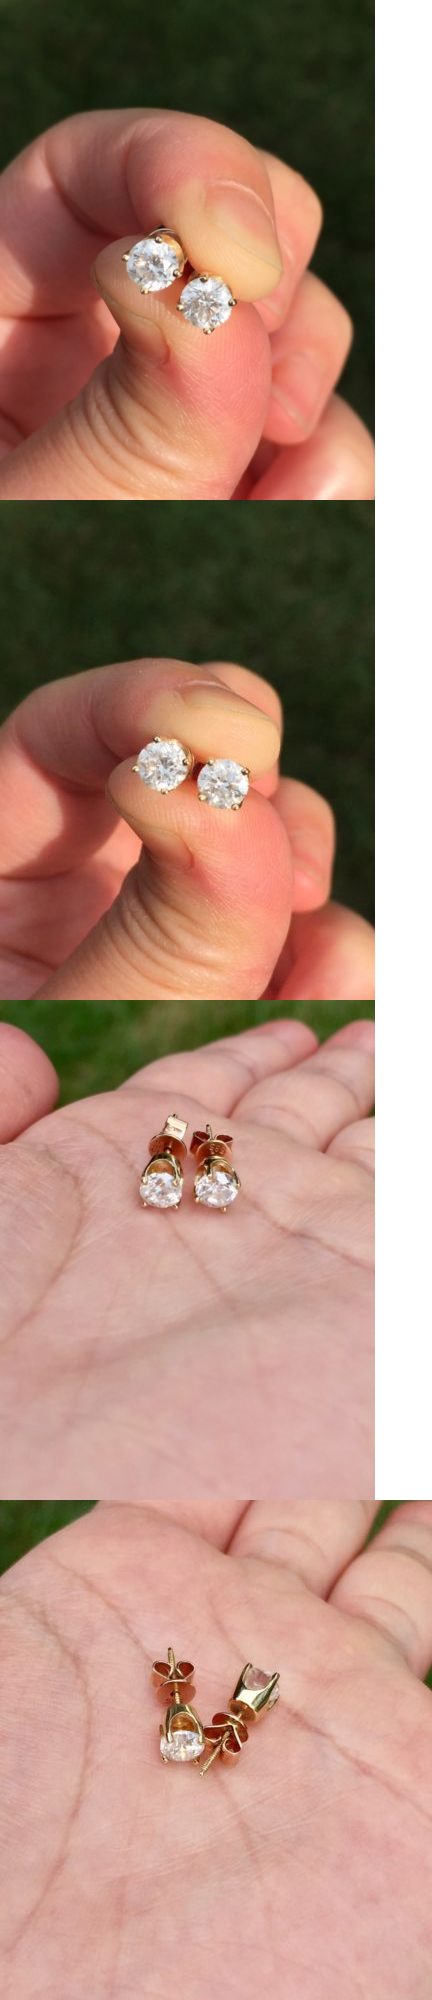 Diamond 10986: E Vs 1.0Tcw Natural Diamond Stud Earrings In Solid ...